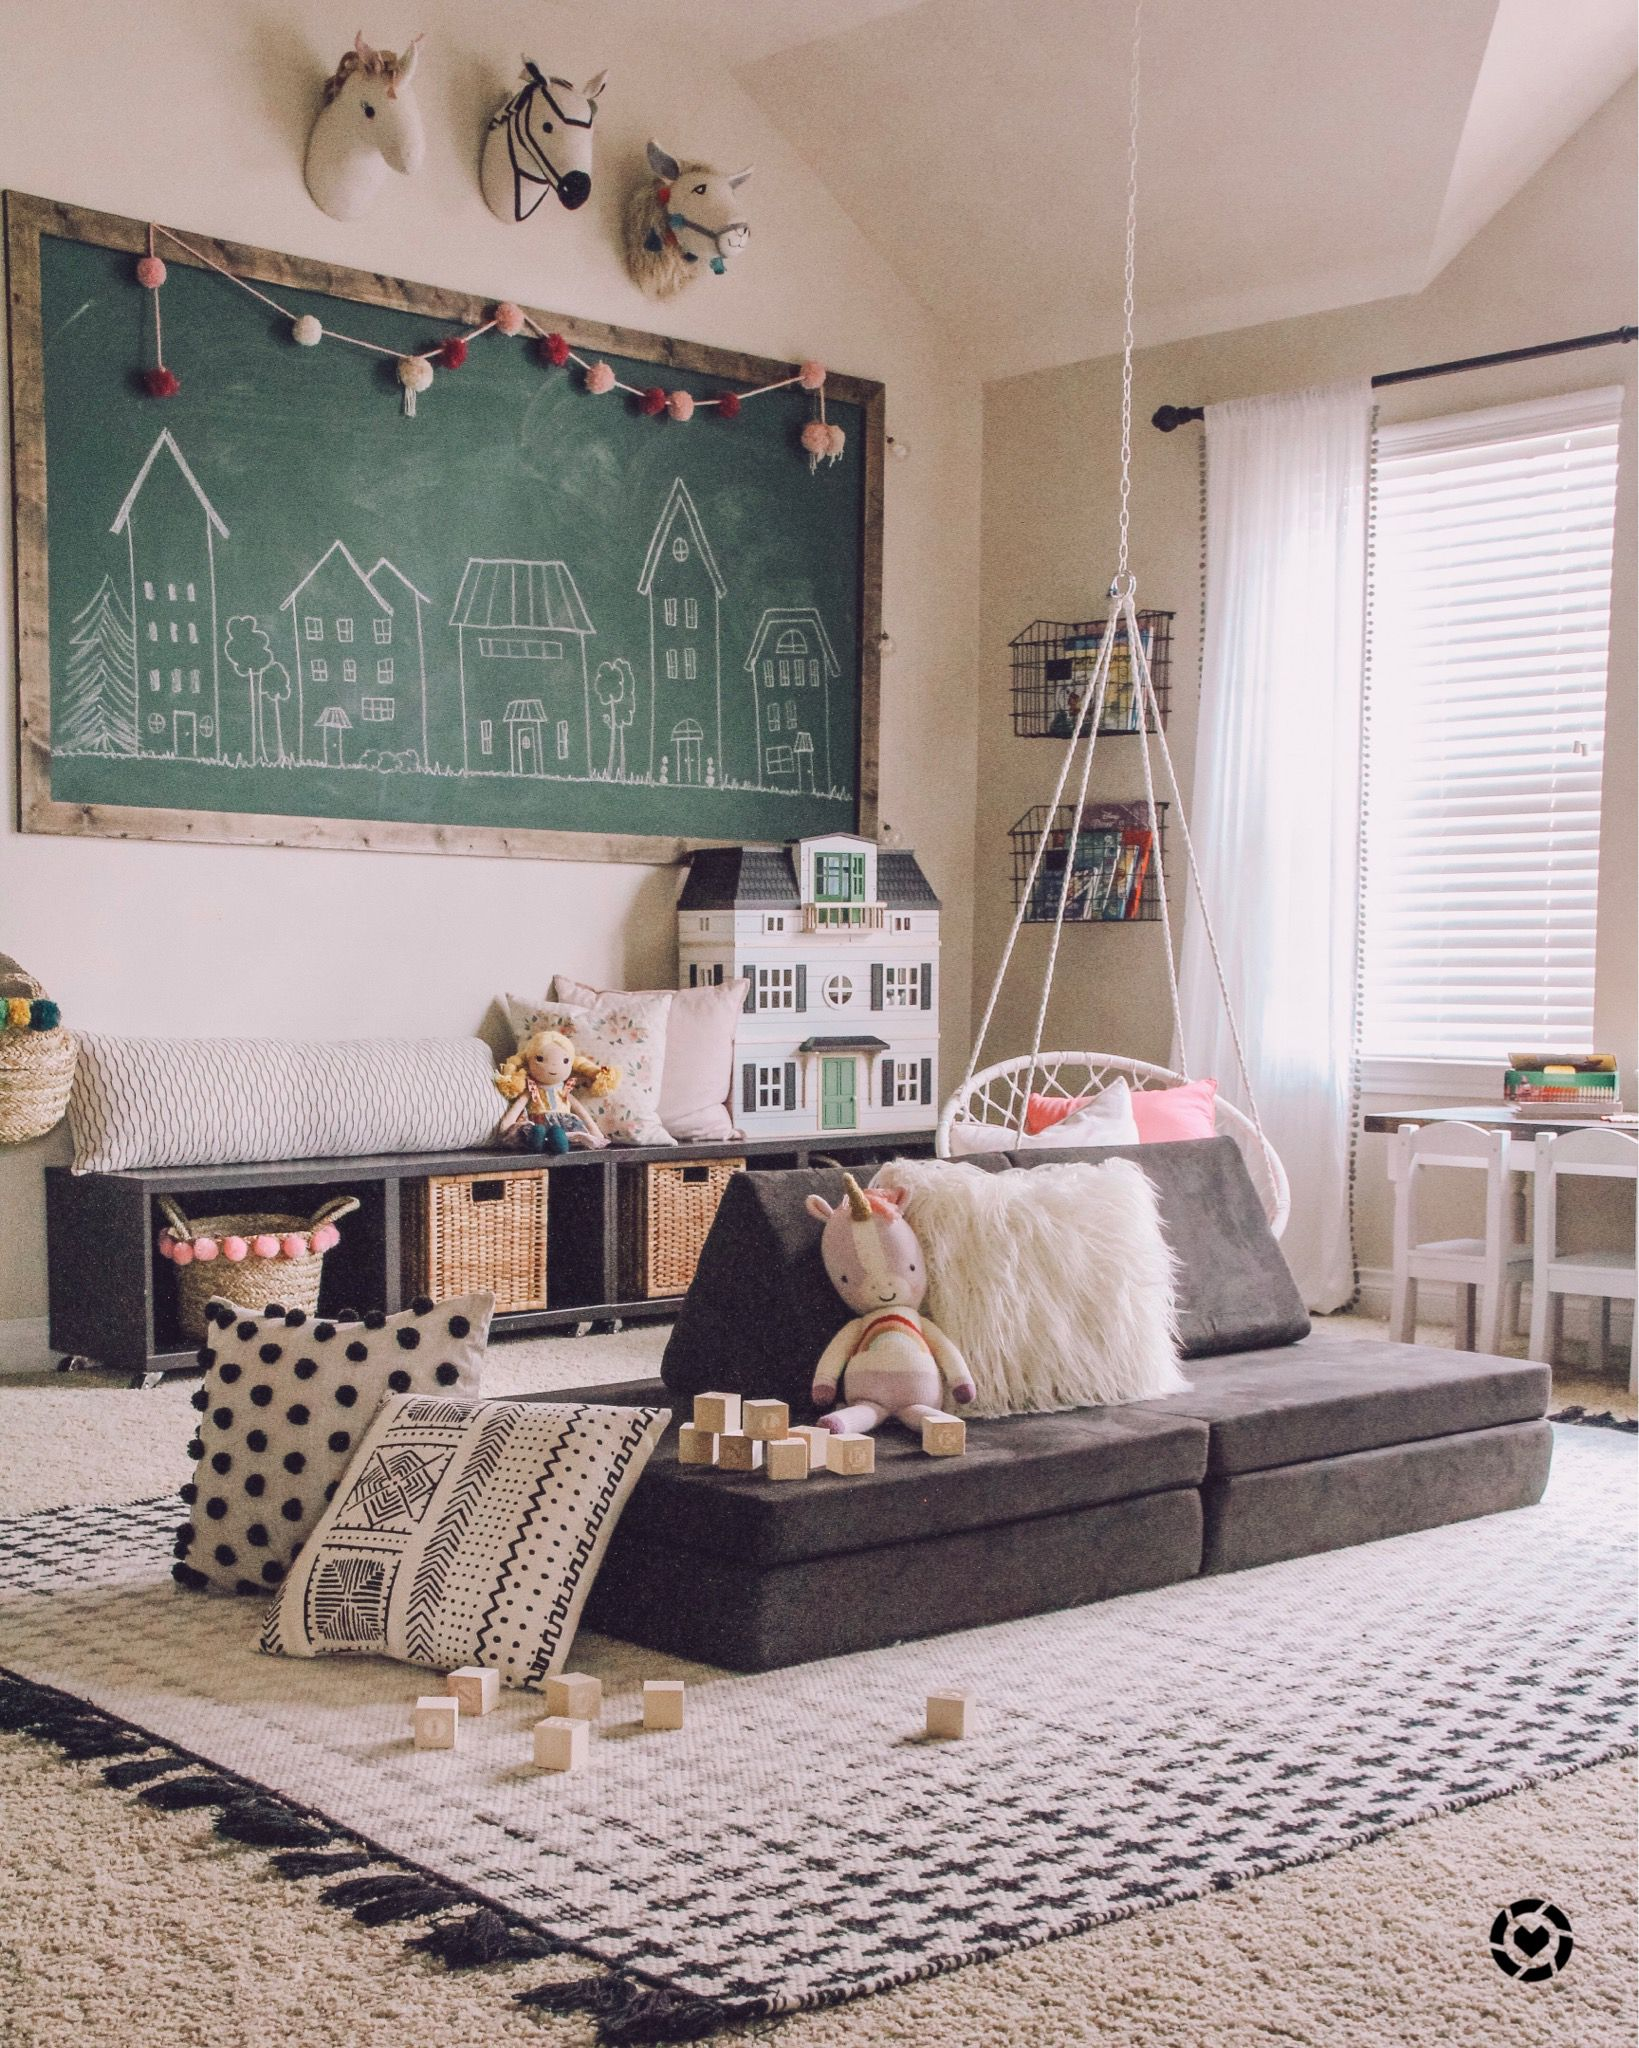 How To Design A Kids Playroom Liketkit Kids Kidsplayroom Kid Room Decor Toddler Playroom Kids Room Design